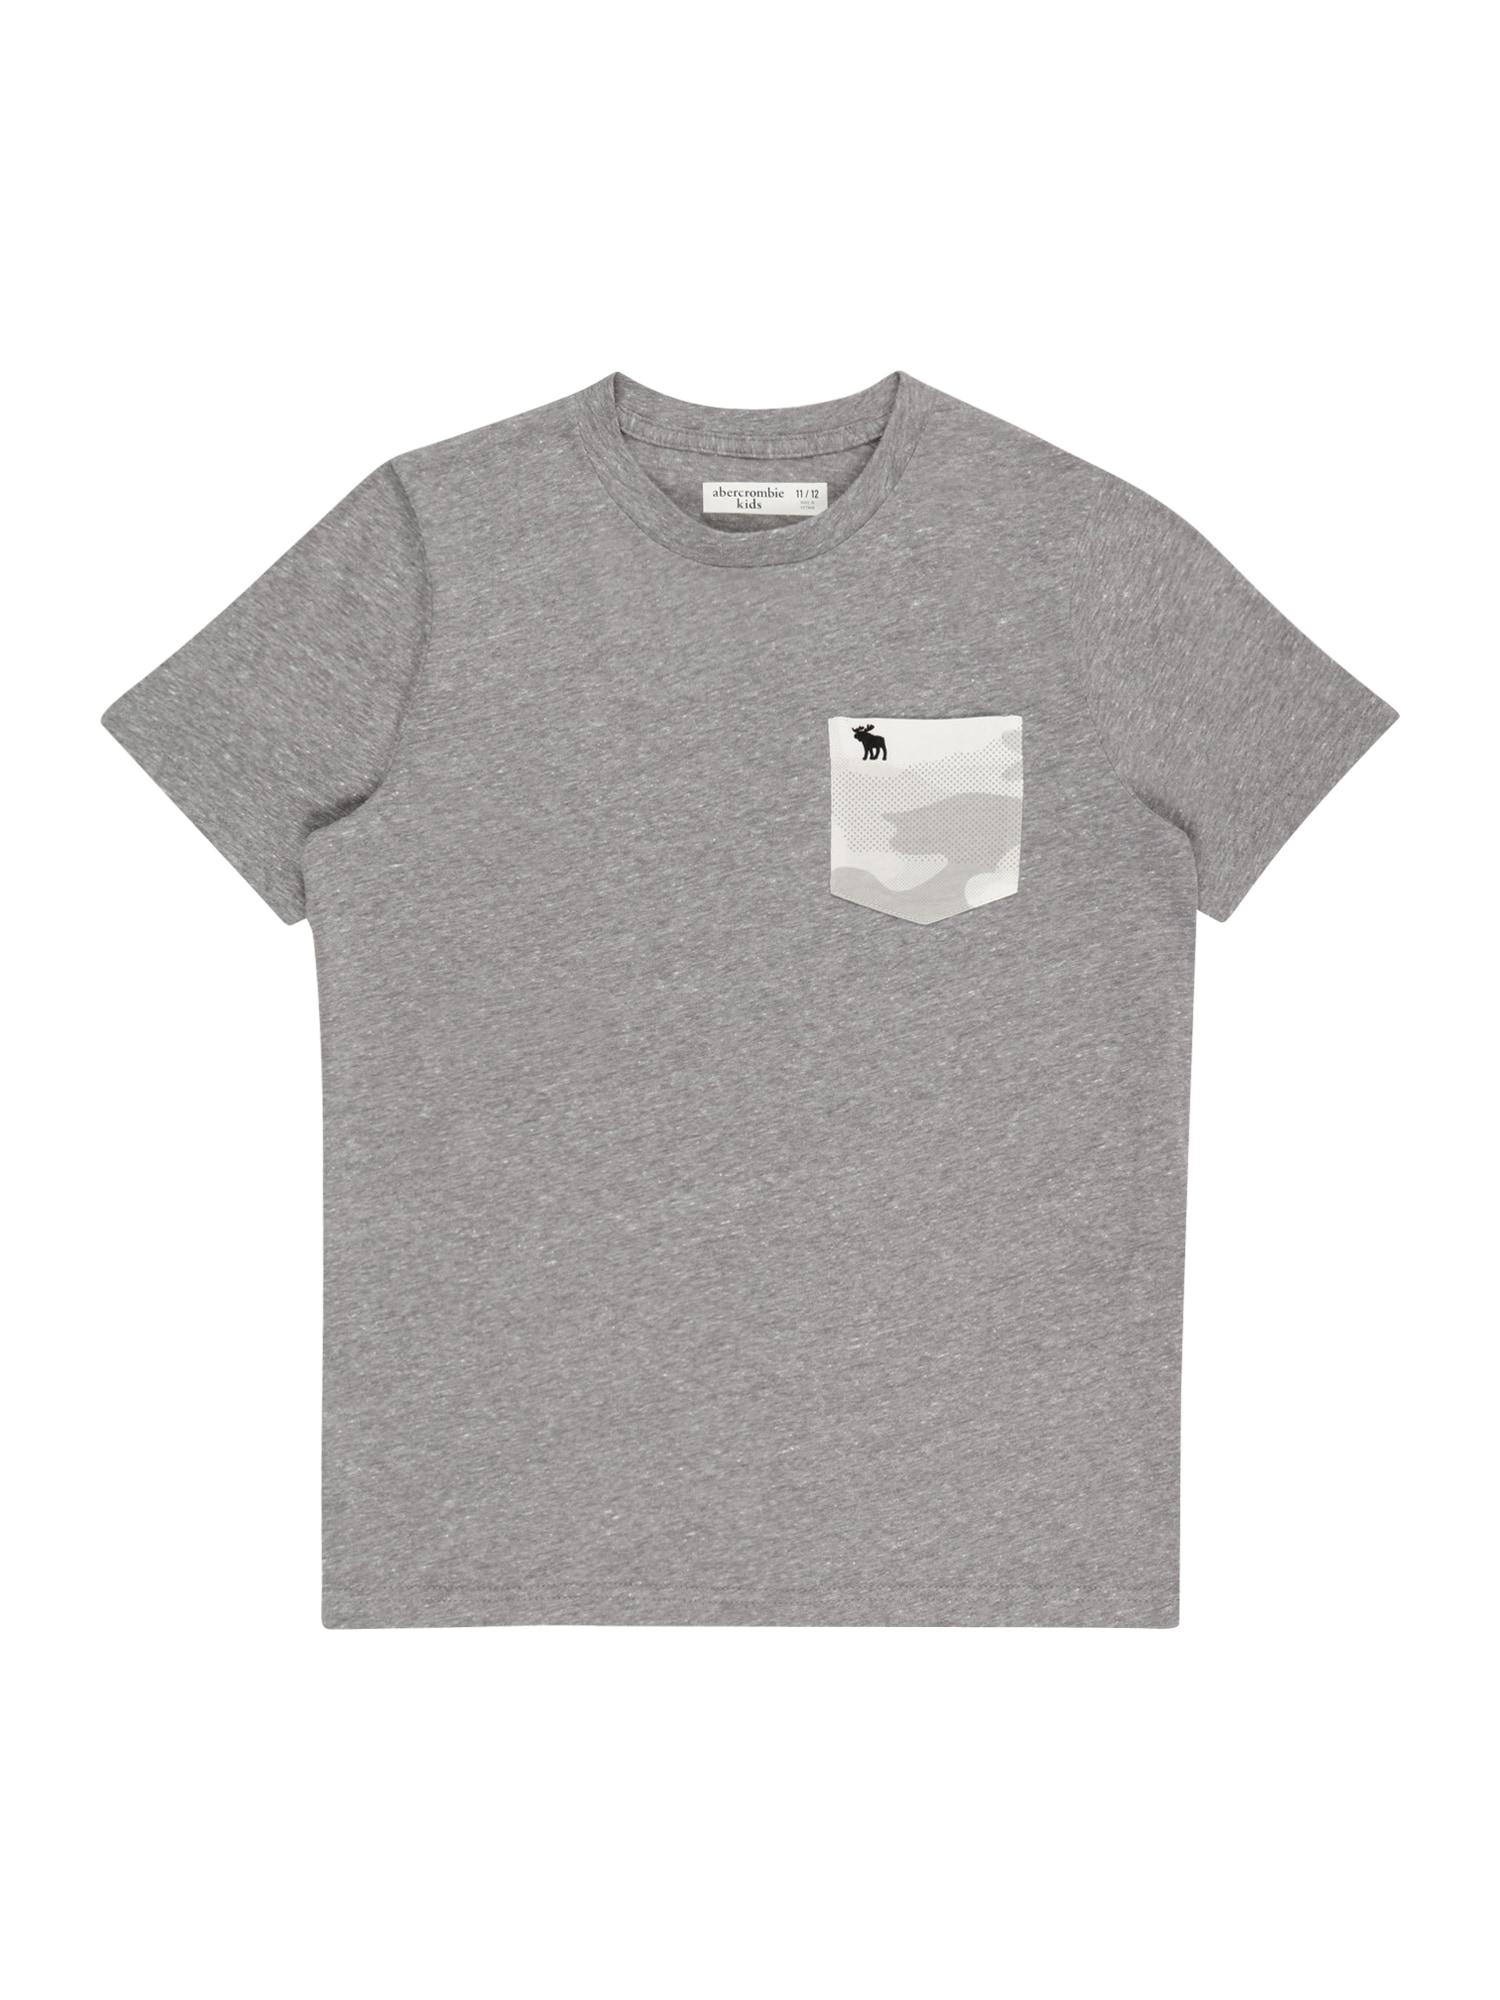 Abercrombie & Fitch Marškinėliai 'NOVELTY' pilka / šviesiai pilka